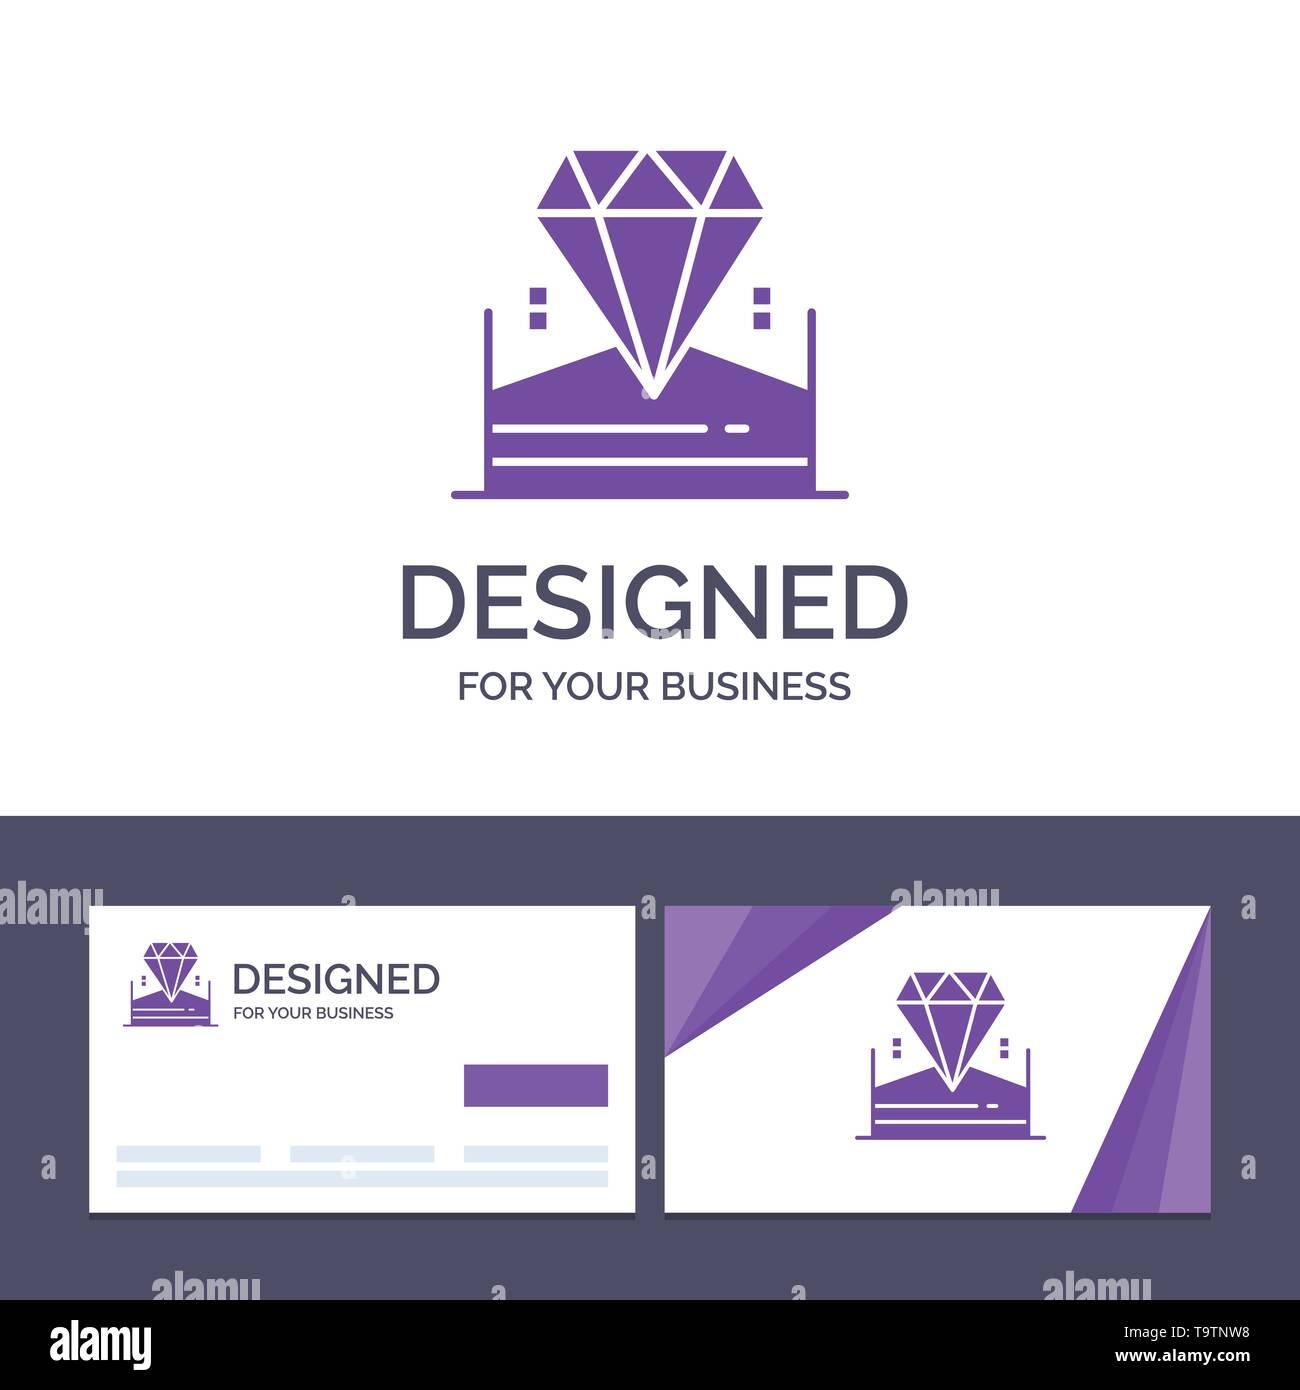 Creative Business Card and Logo template Brilliant, Diamond, Jewel, Hotel Vector Illustration - Stock Image